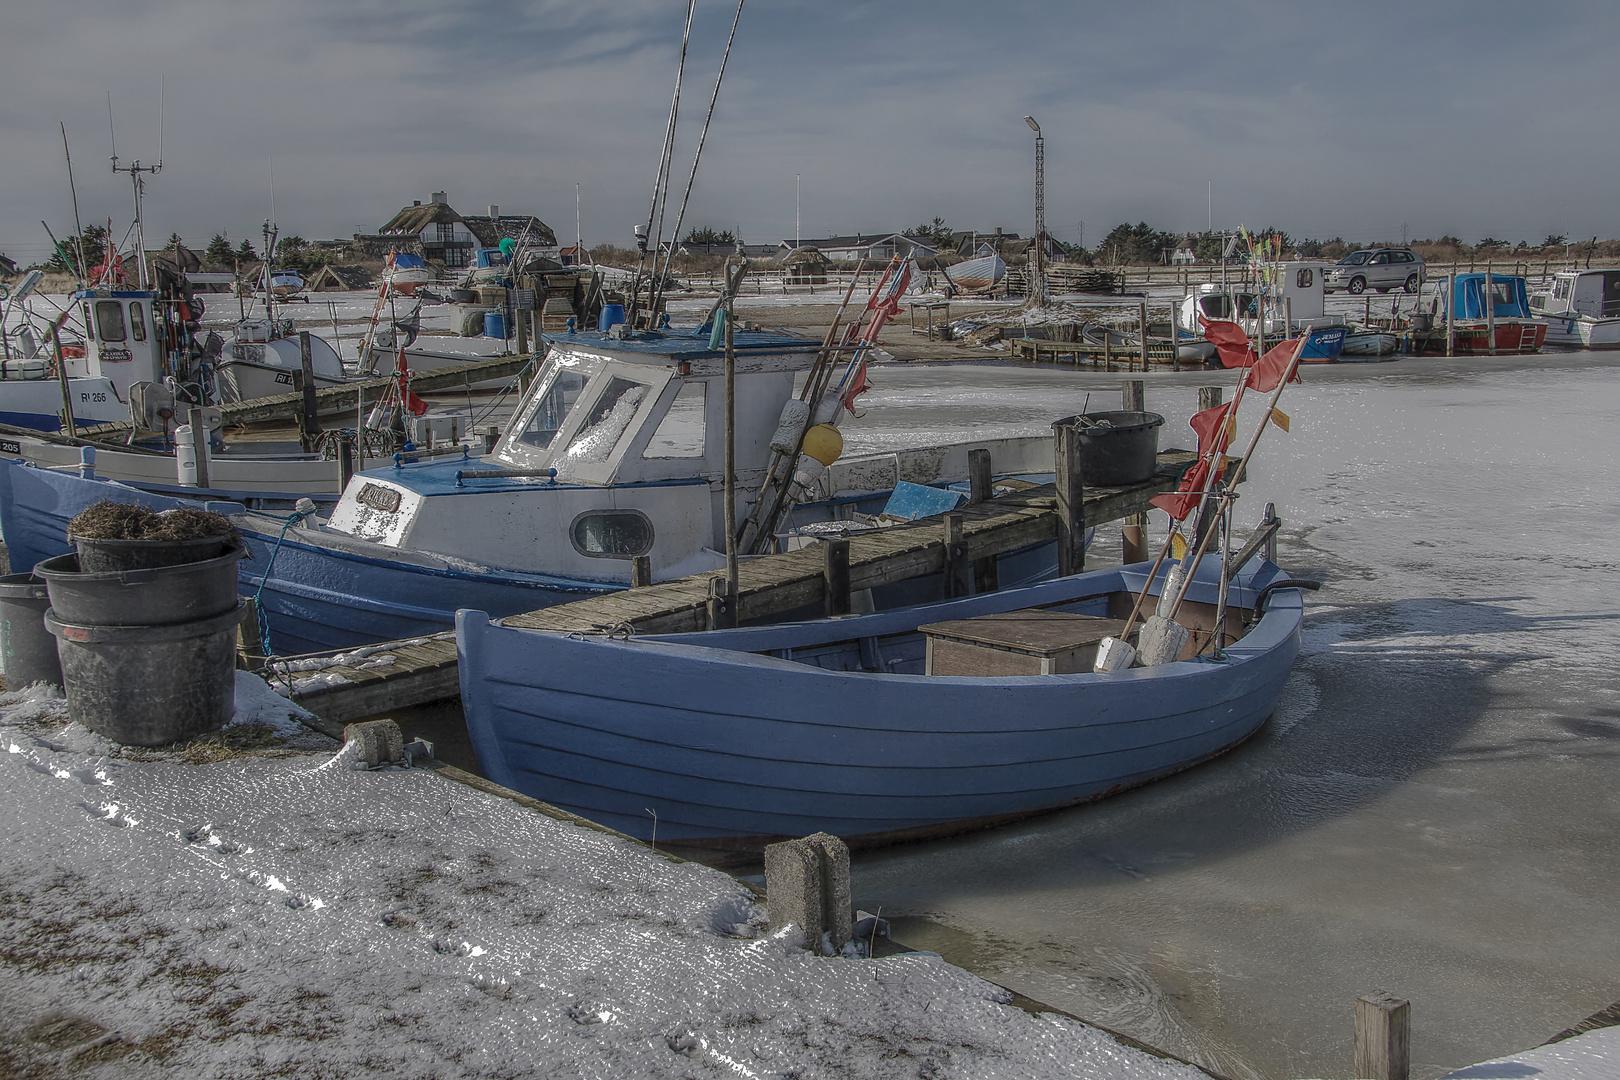 HDR/Hafen Dänemark